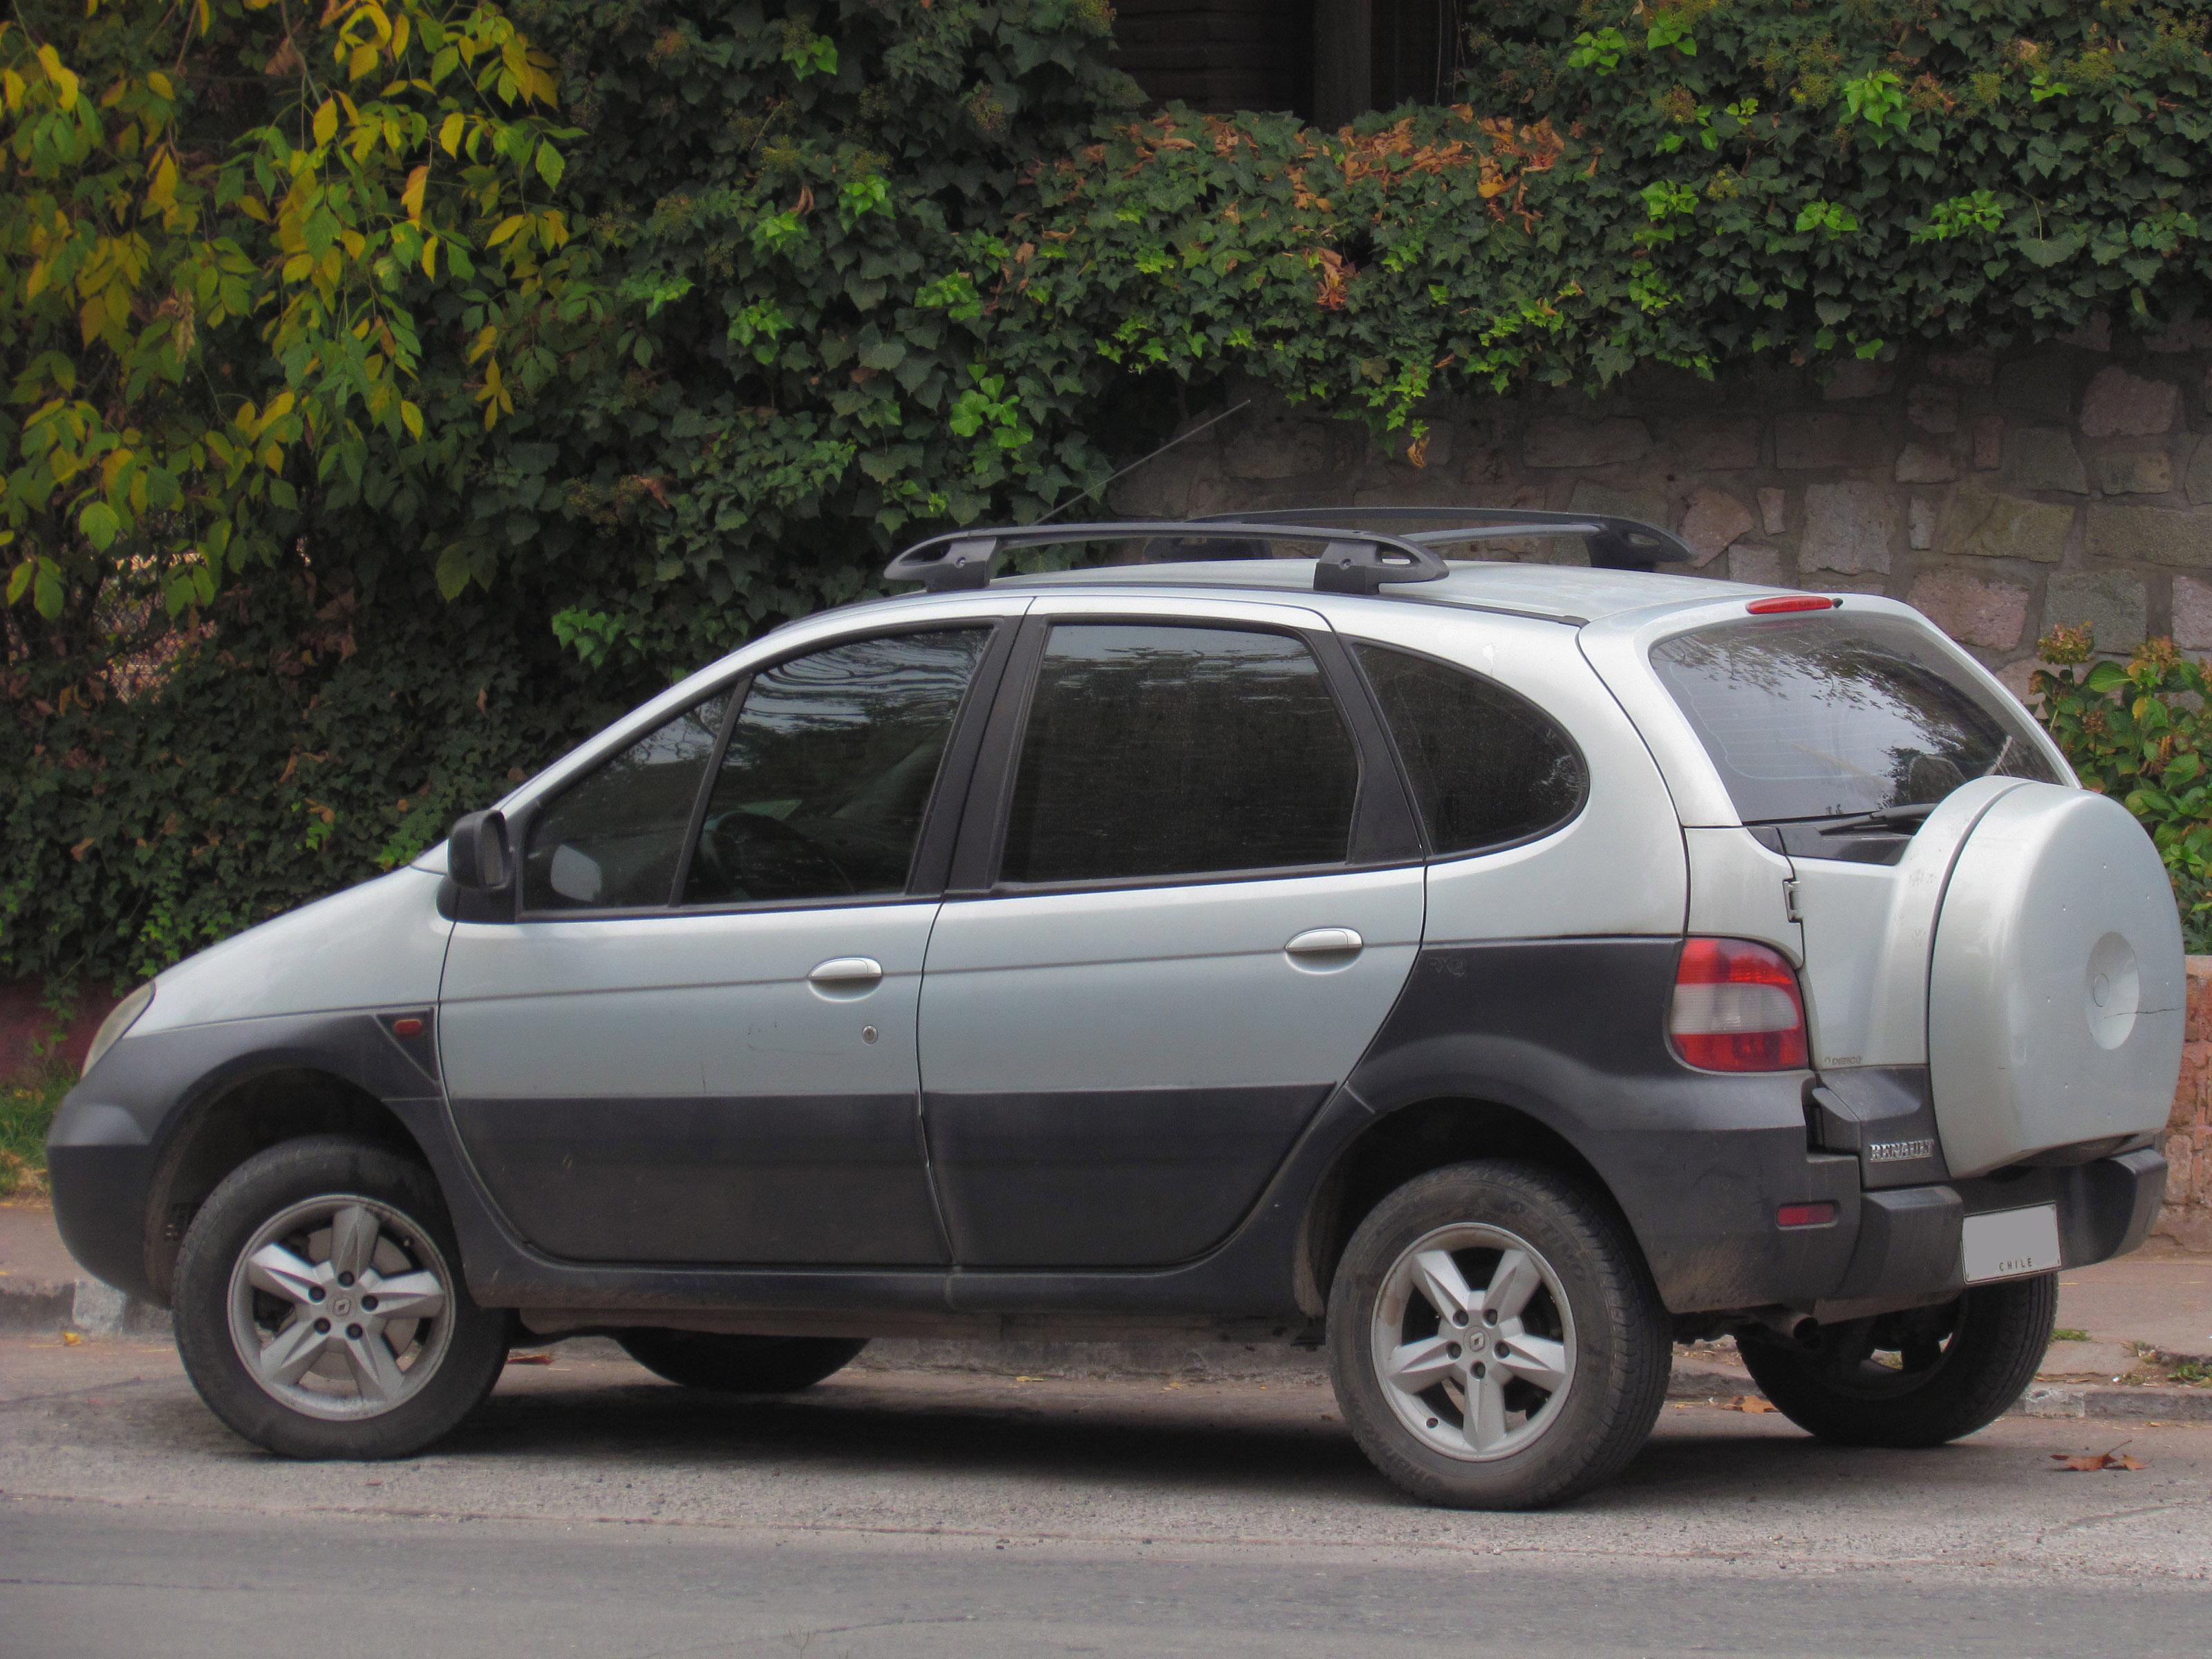 Renault scenic 2003 problems